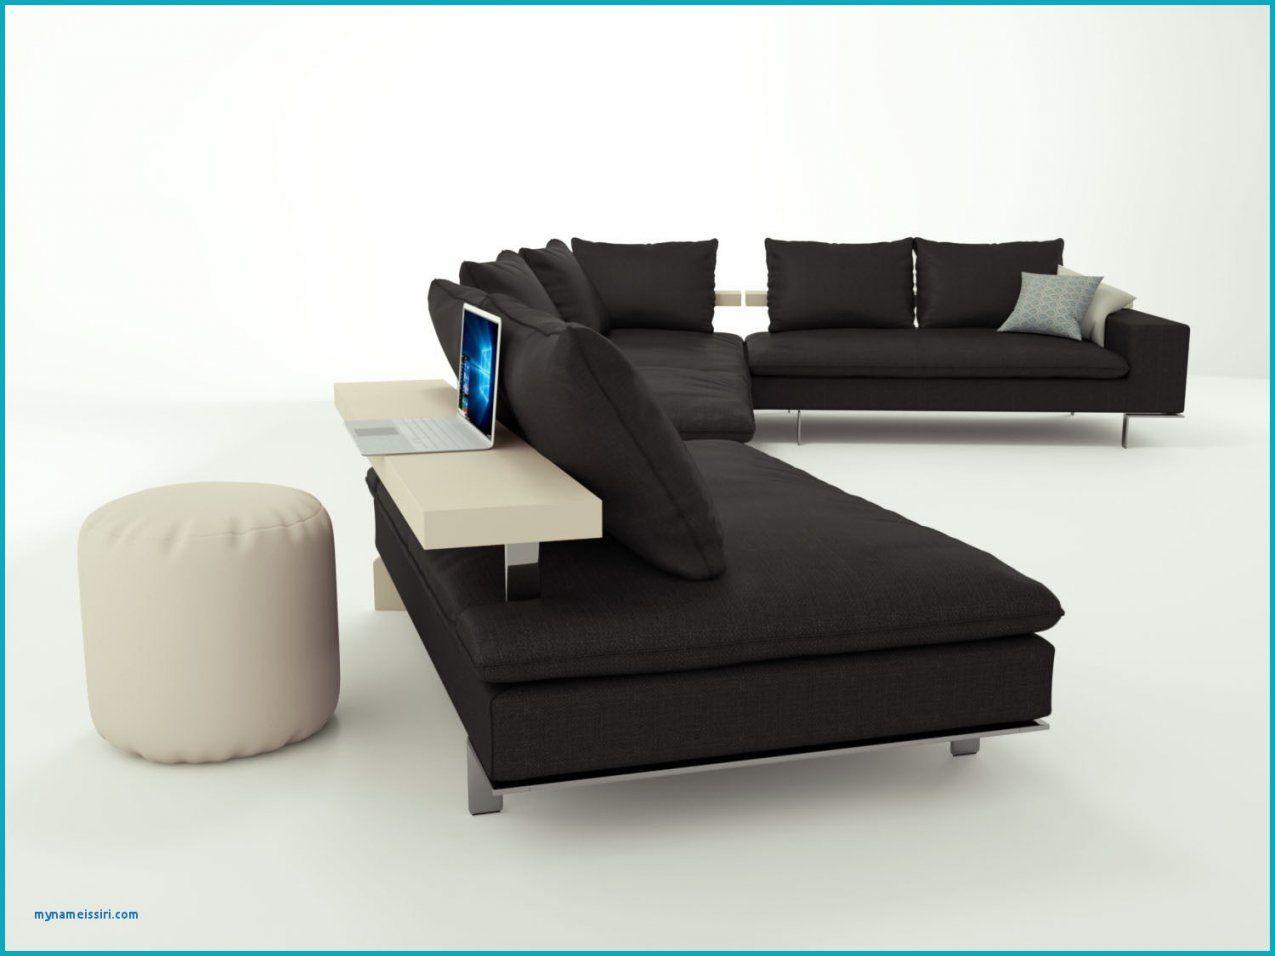 sofa mit ablage beautiful rckenkissen bett fabelhaft sofa ablage cool innovagoods mit. Black Bedroom Furniture Sets. Home Design Ideas